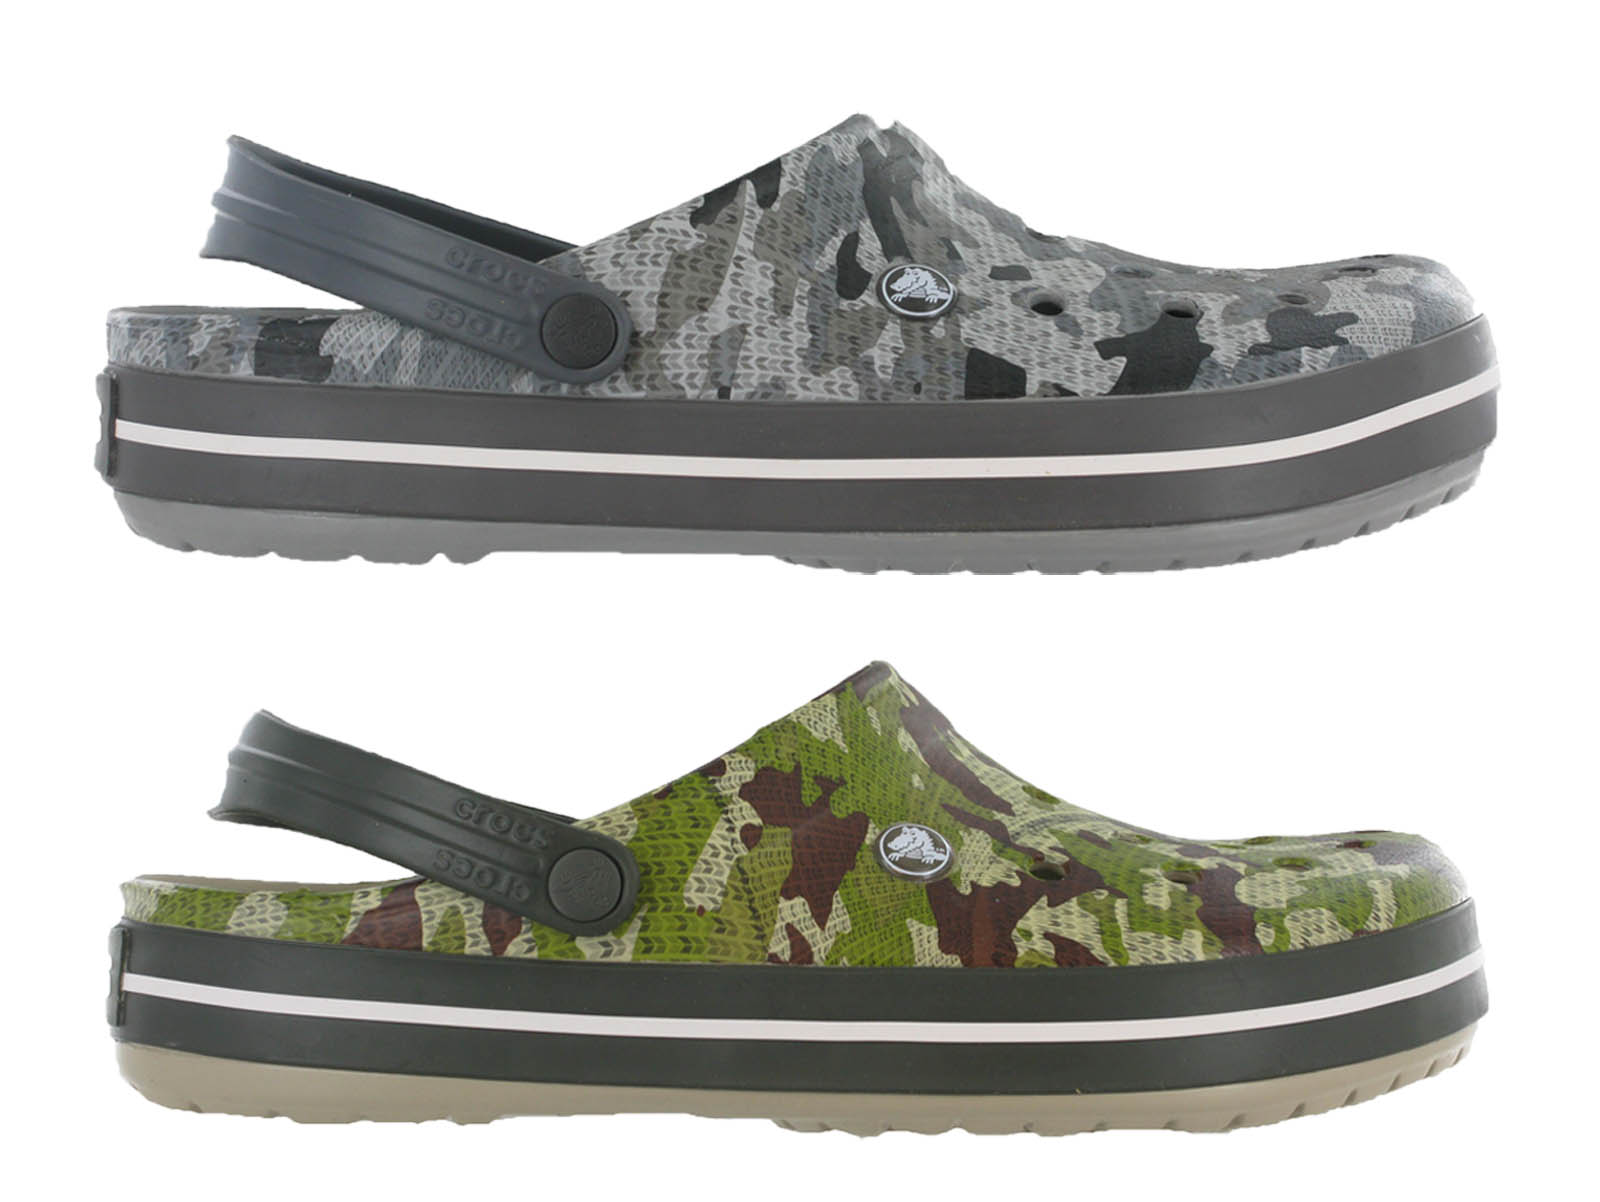 Crocs Crocband Camo Clog Unisex Slip On Comfort